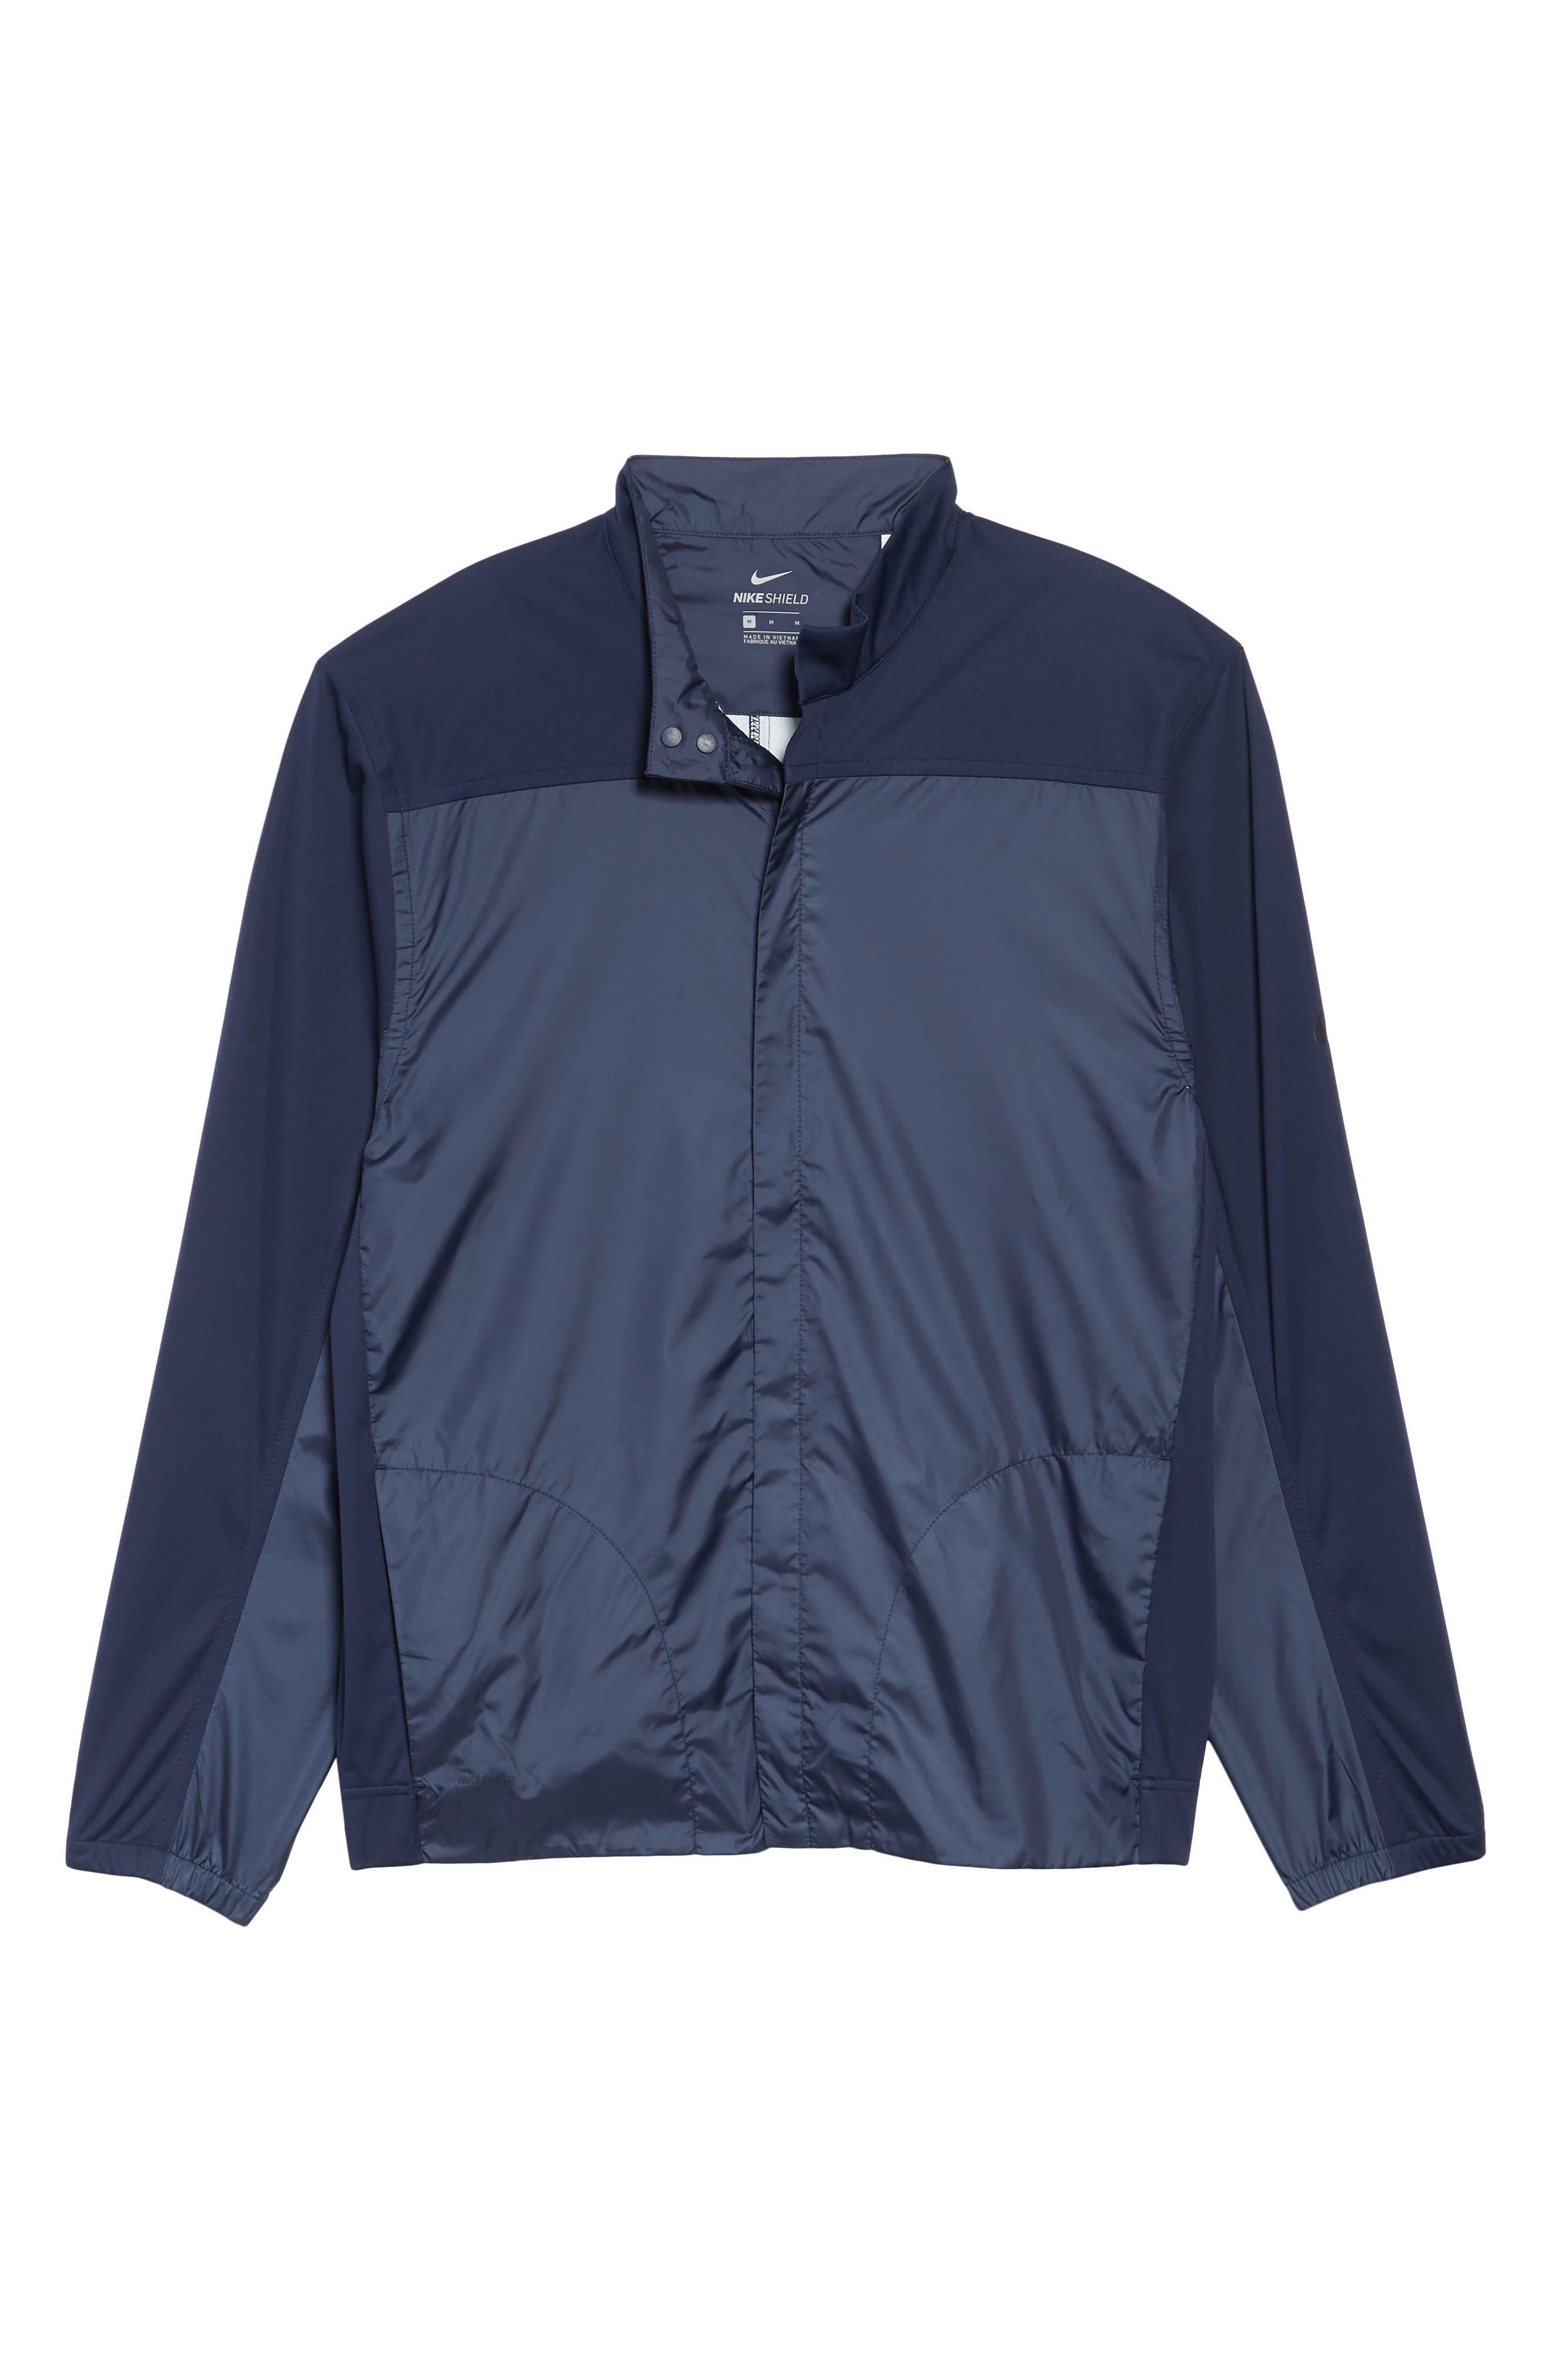 Shield Core Zip Golf Jacket,                             Alternate thumbnail 6, color,                             OBSIDIAN/ OBSIDIAN/ BLACK